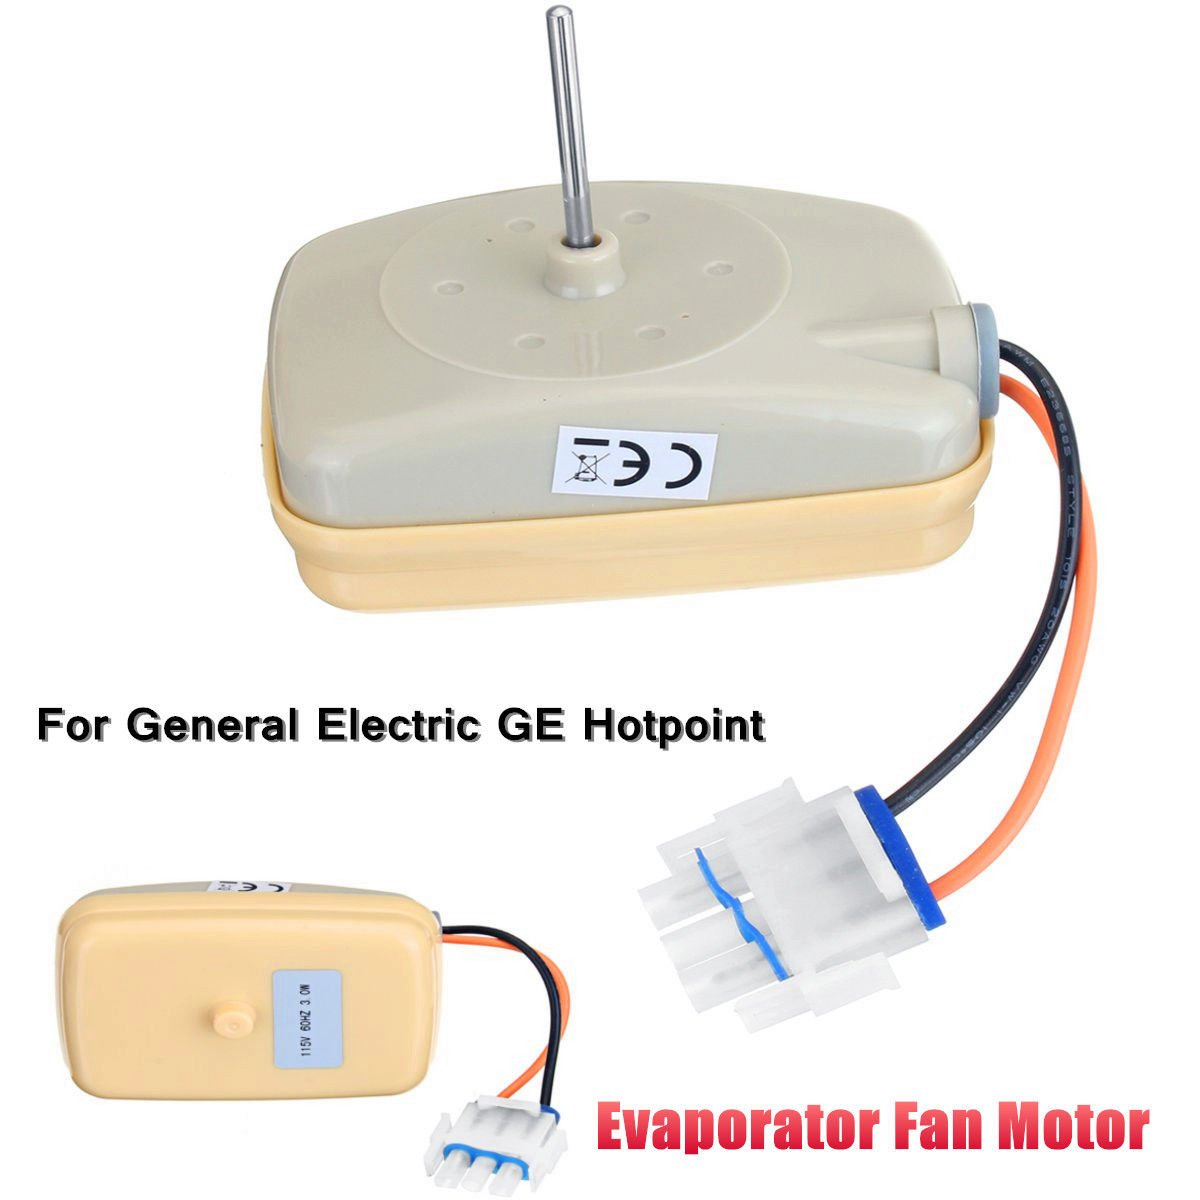 MAYITOP Evaporator Fan Motor WR60X10141 WR60X10346 WR60X10045 WR60X10046 WR60X10072 WR60X10138 For General Electric, Sears, Kenmore, Hotpoint, RCA WR60X23584